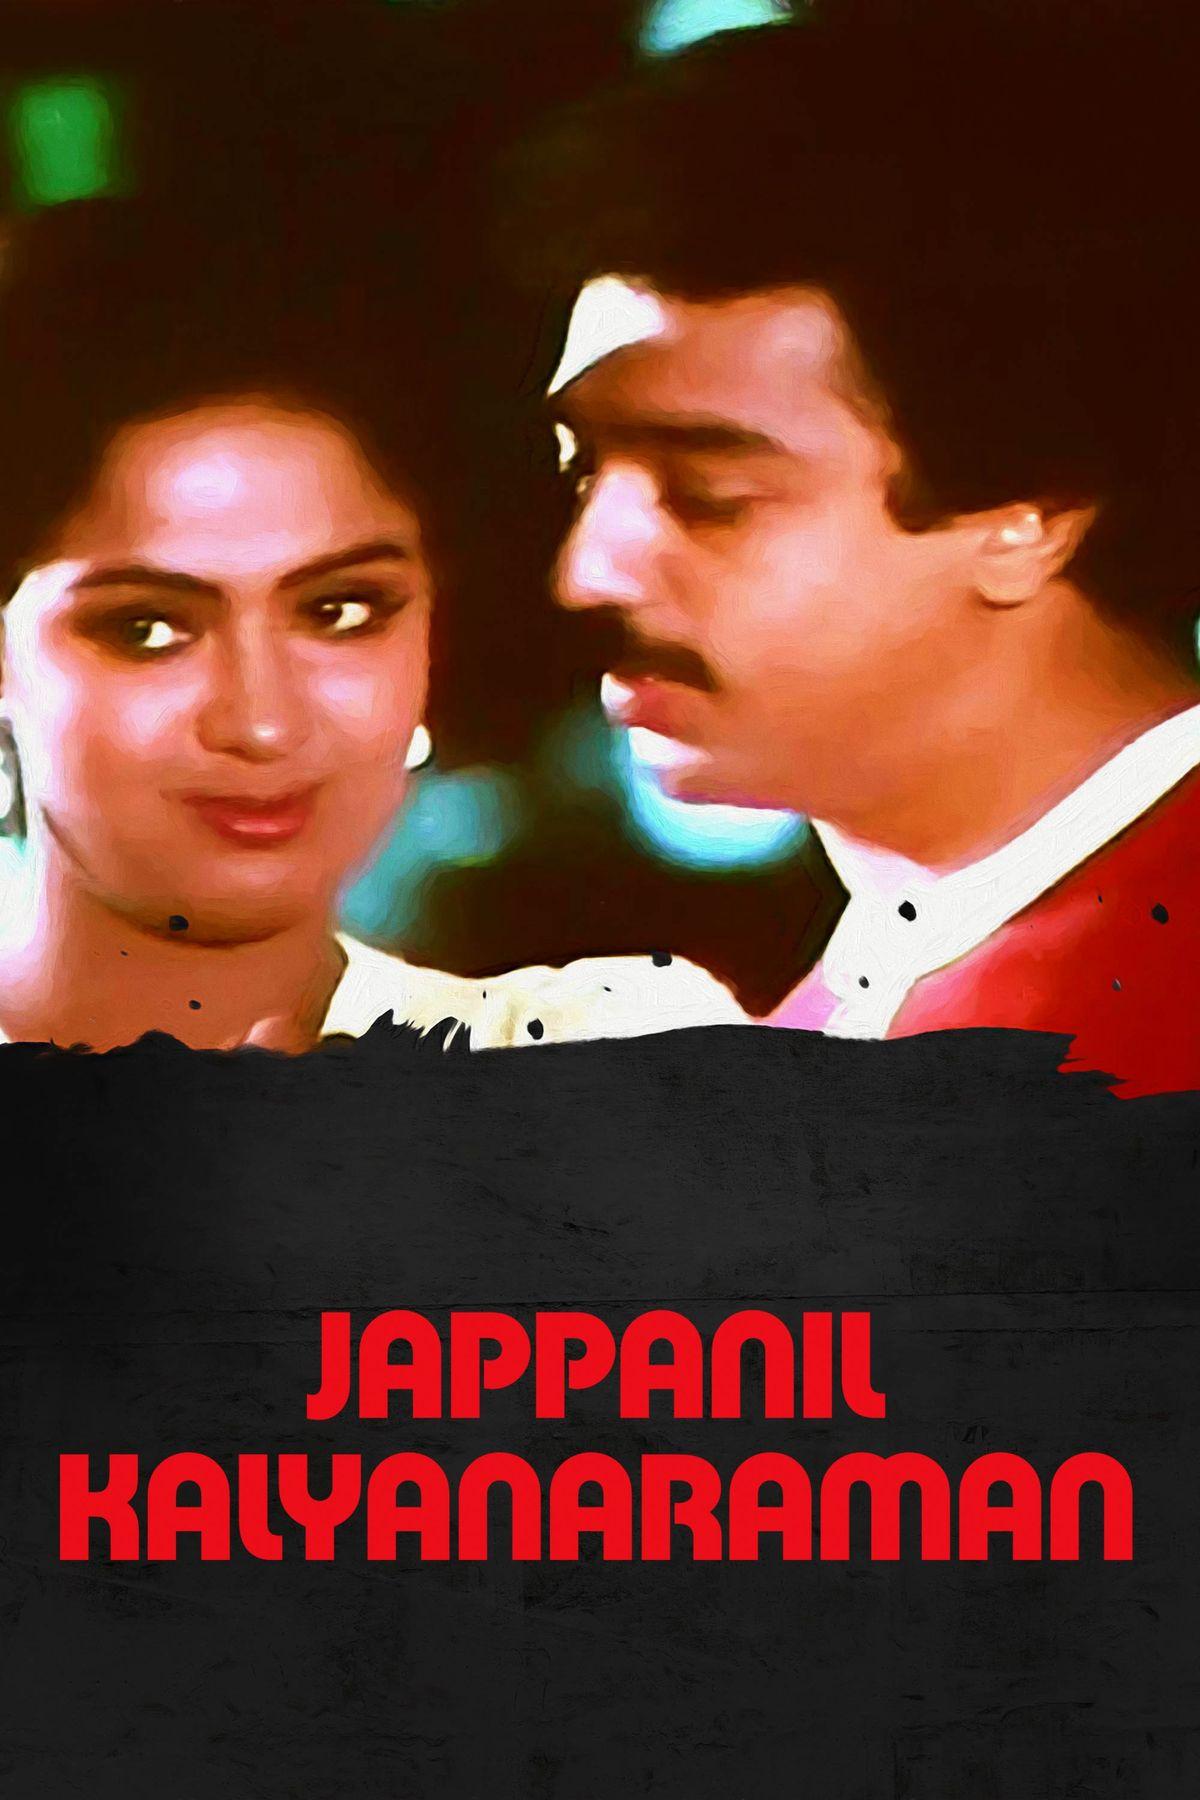 Jappanil Kalyanaraman